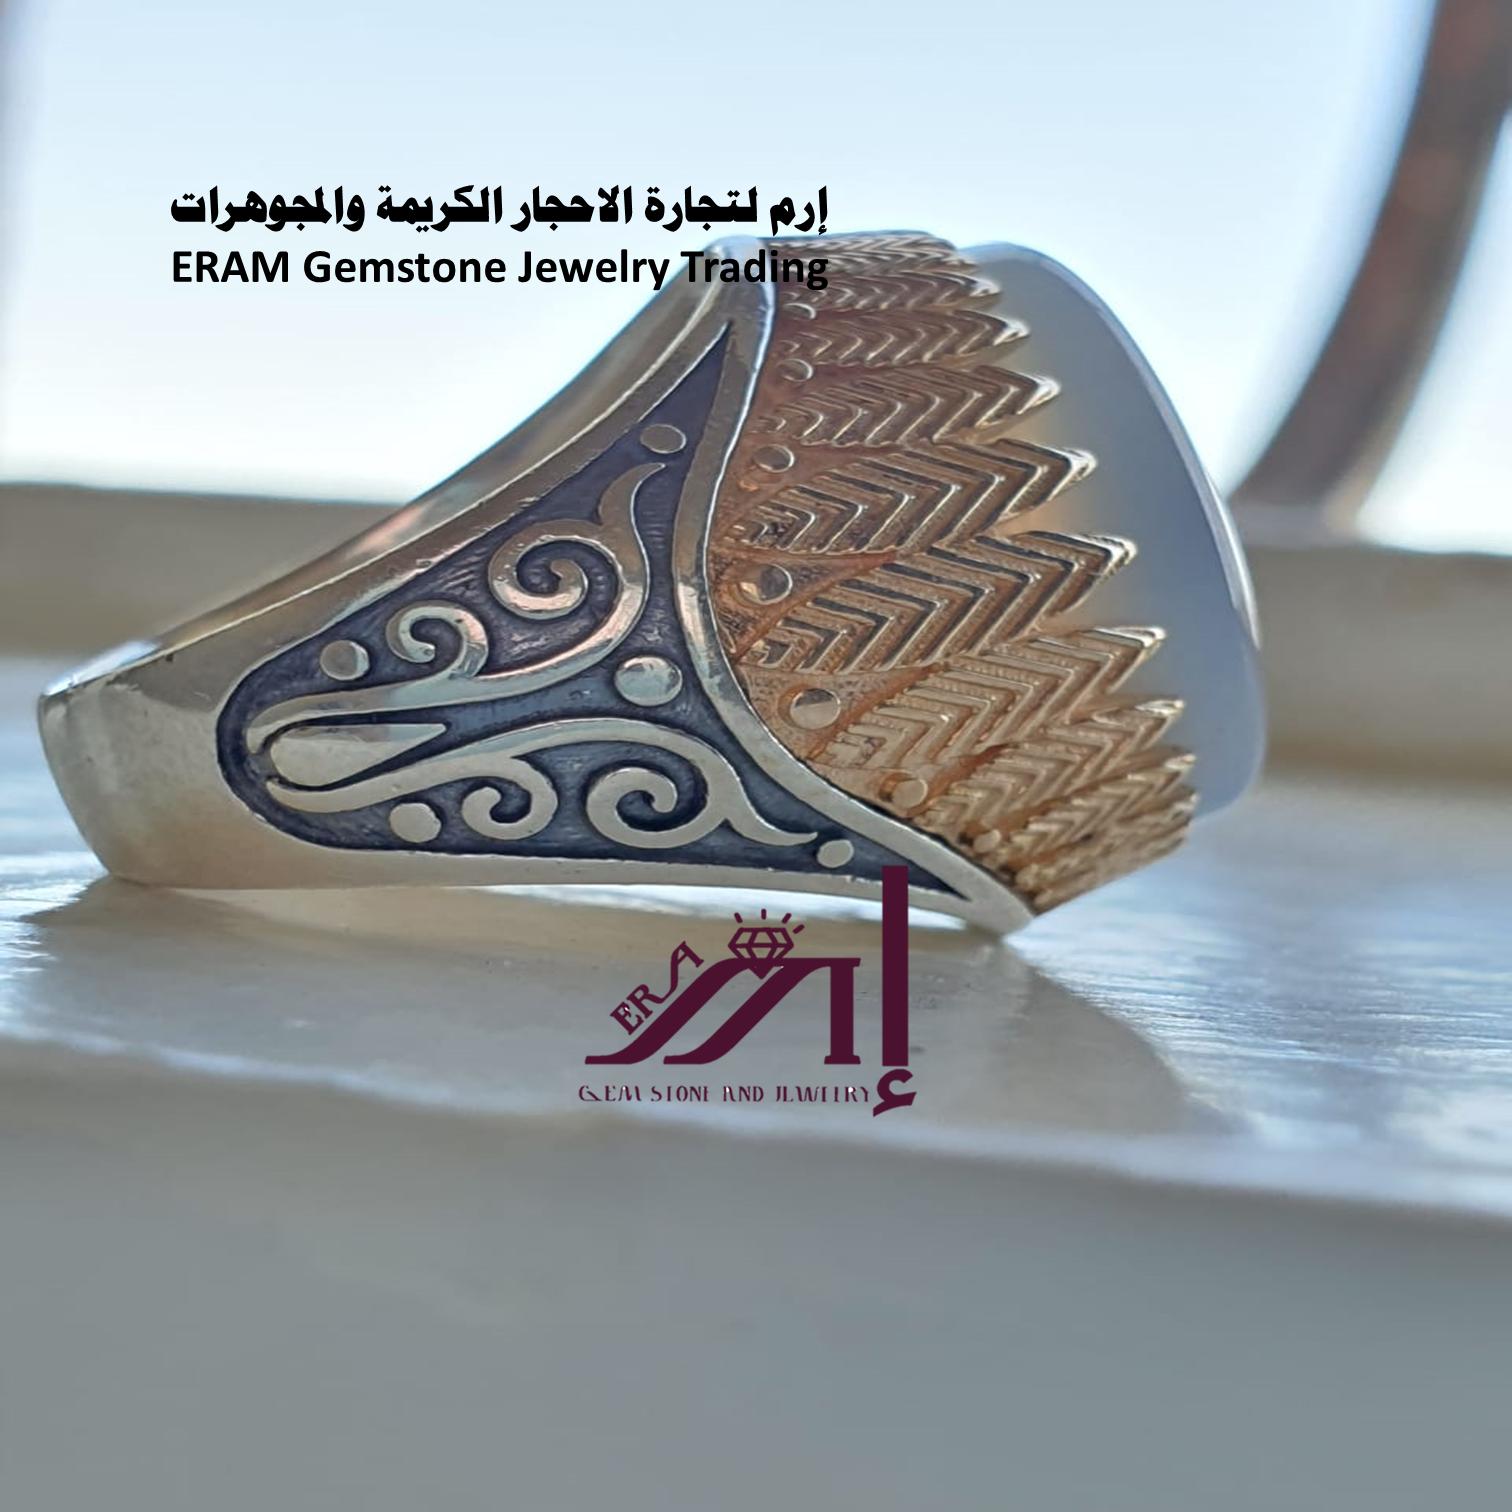 نحن للفخامة عنوان خاتم عقيق يمني ازرق سماوي Agate مميز طبيعي100 للعرض Gemstone Jewelry Gemstones Jewelry